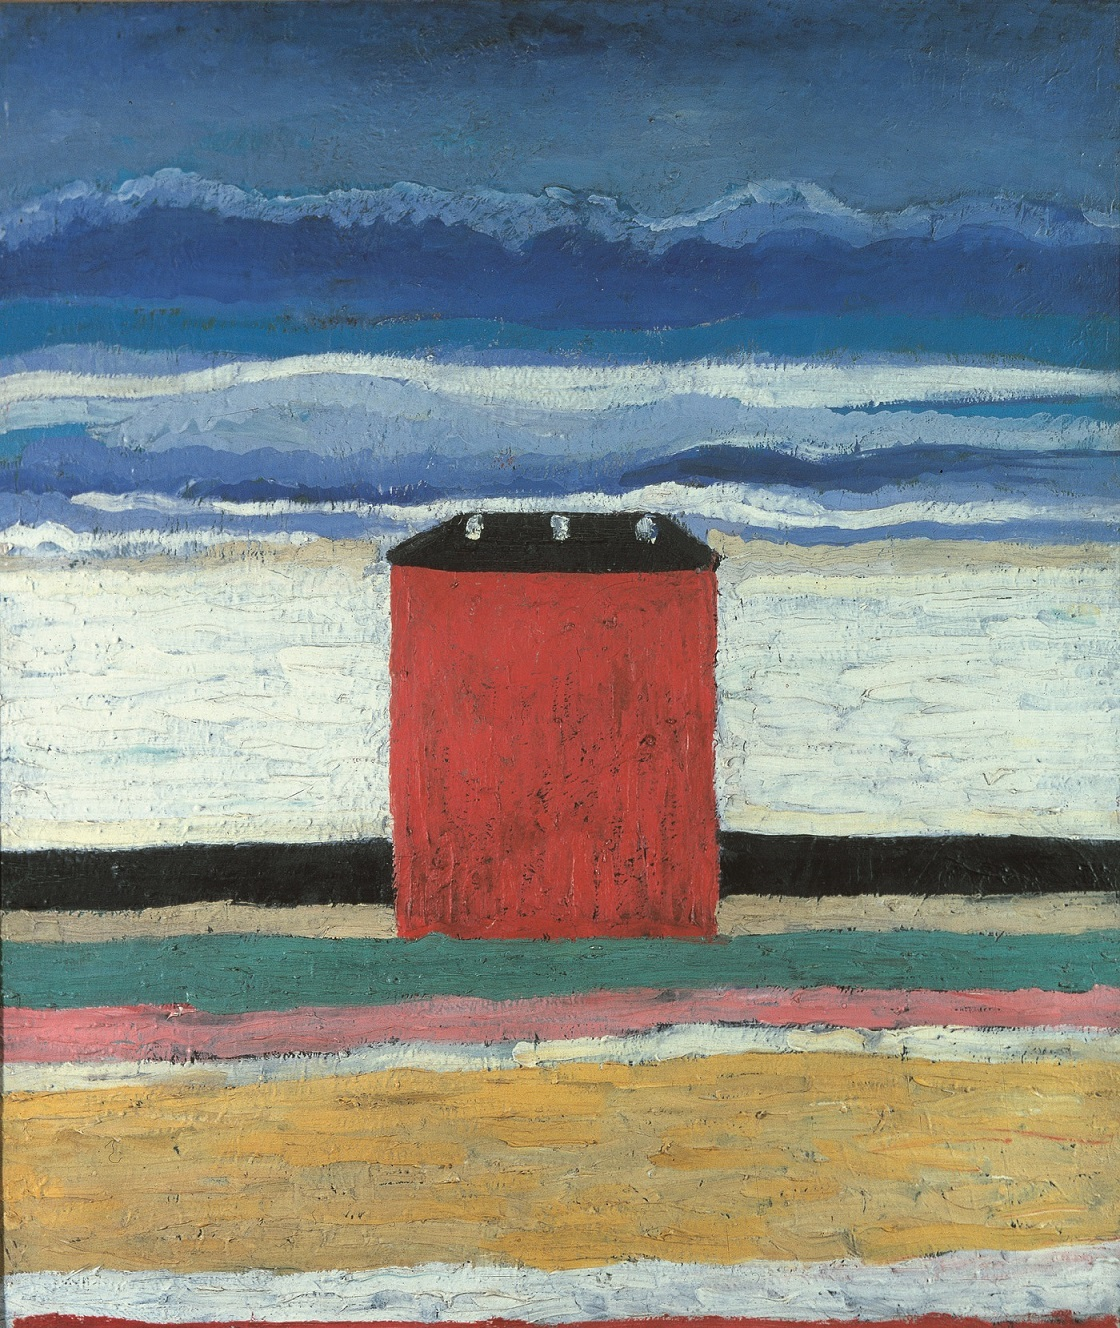 Kazimir Malevič, Casa rossa (1932), olio su tela, 63 x 55 cm, Museo di Stato Russo, San Pietroburgo